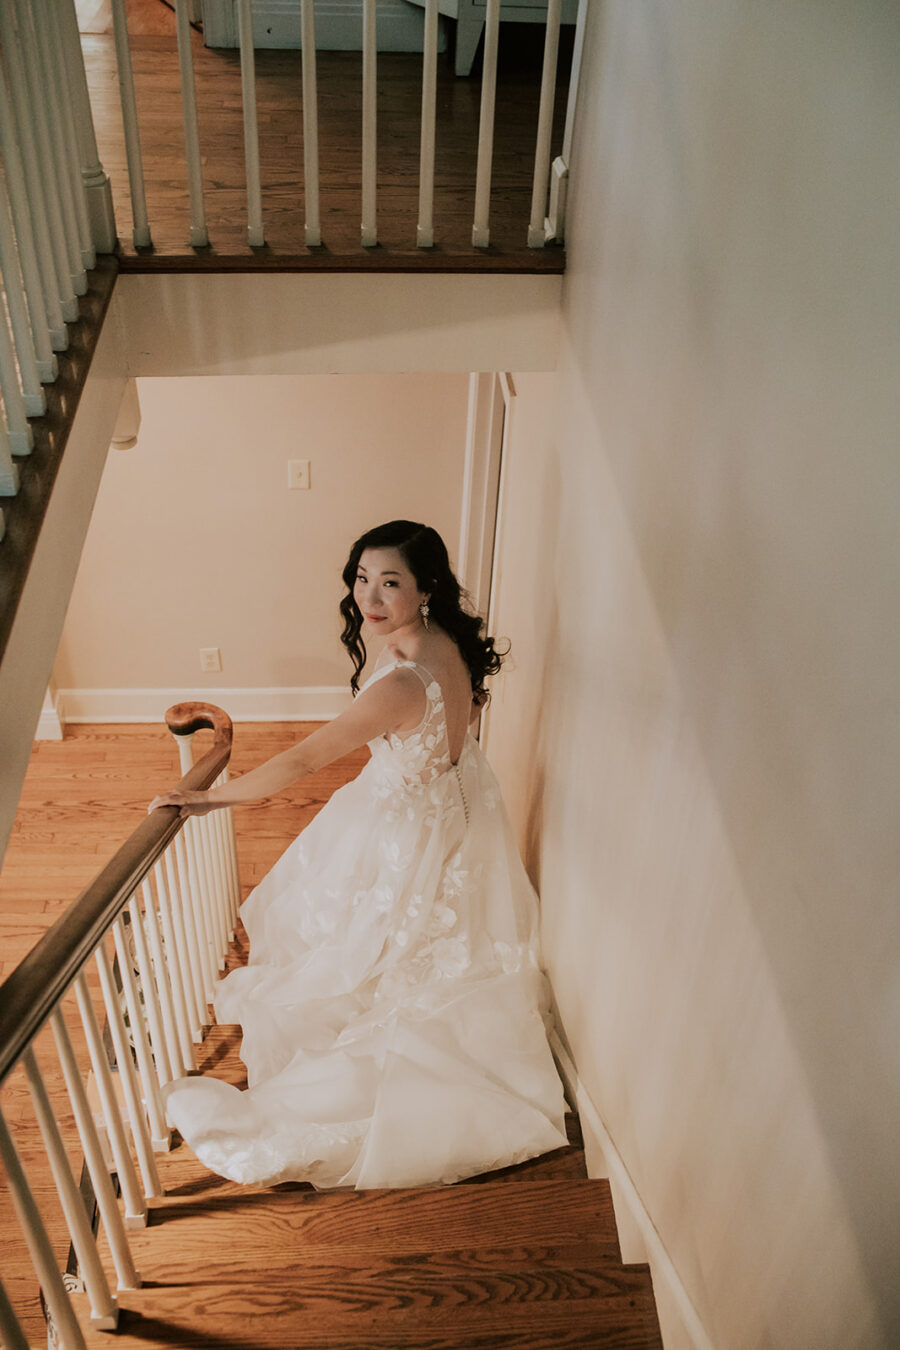 Bridal portrait: Summer Soiree at Cedarwood Weddings featured on Nashville Bride Guide